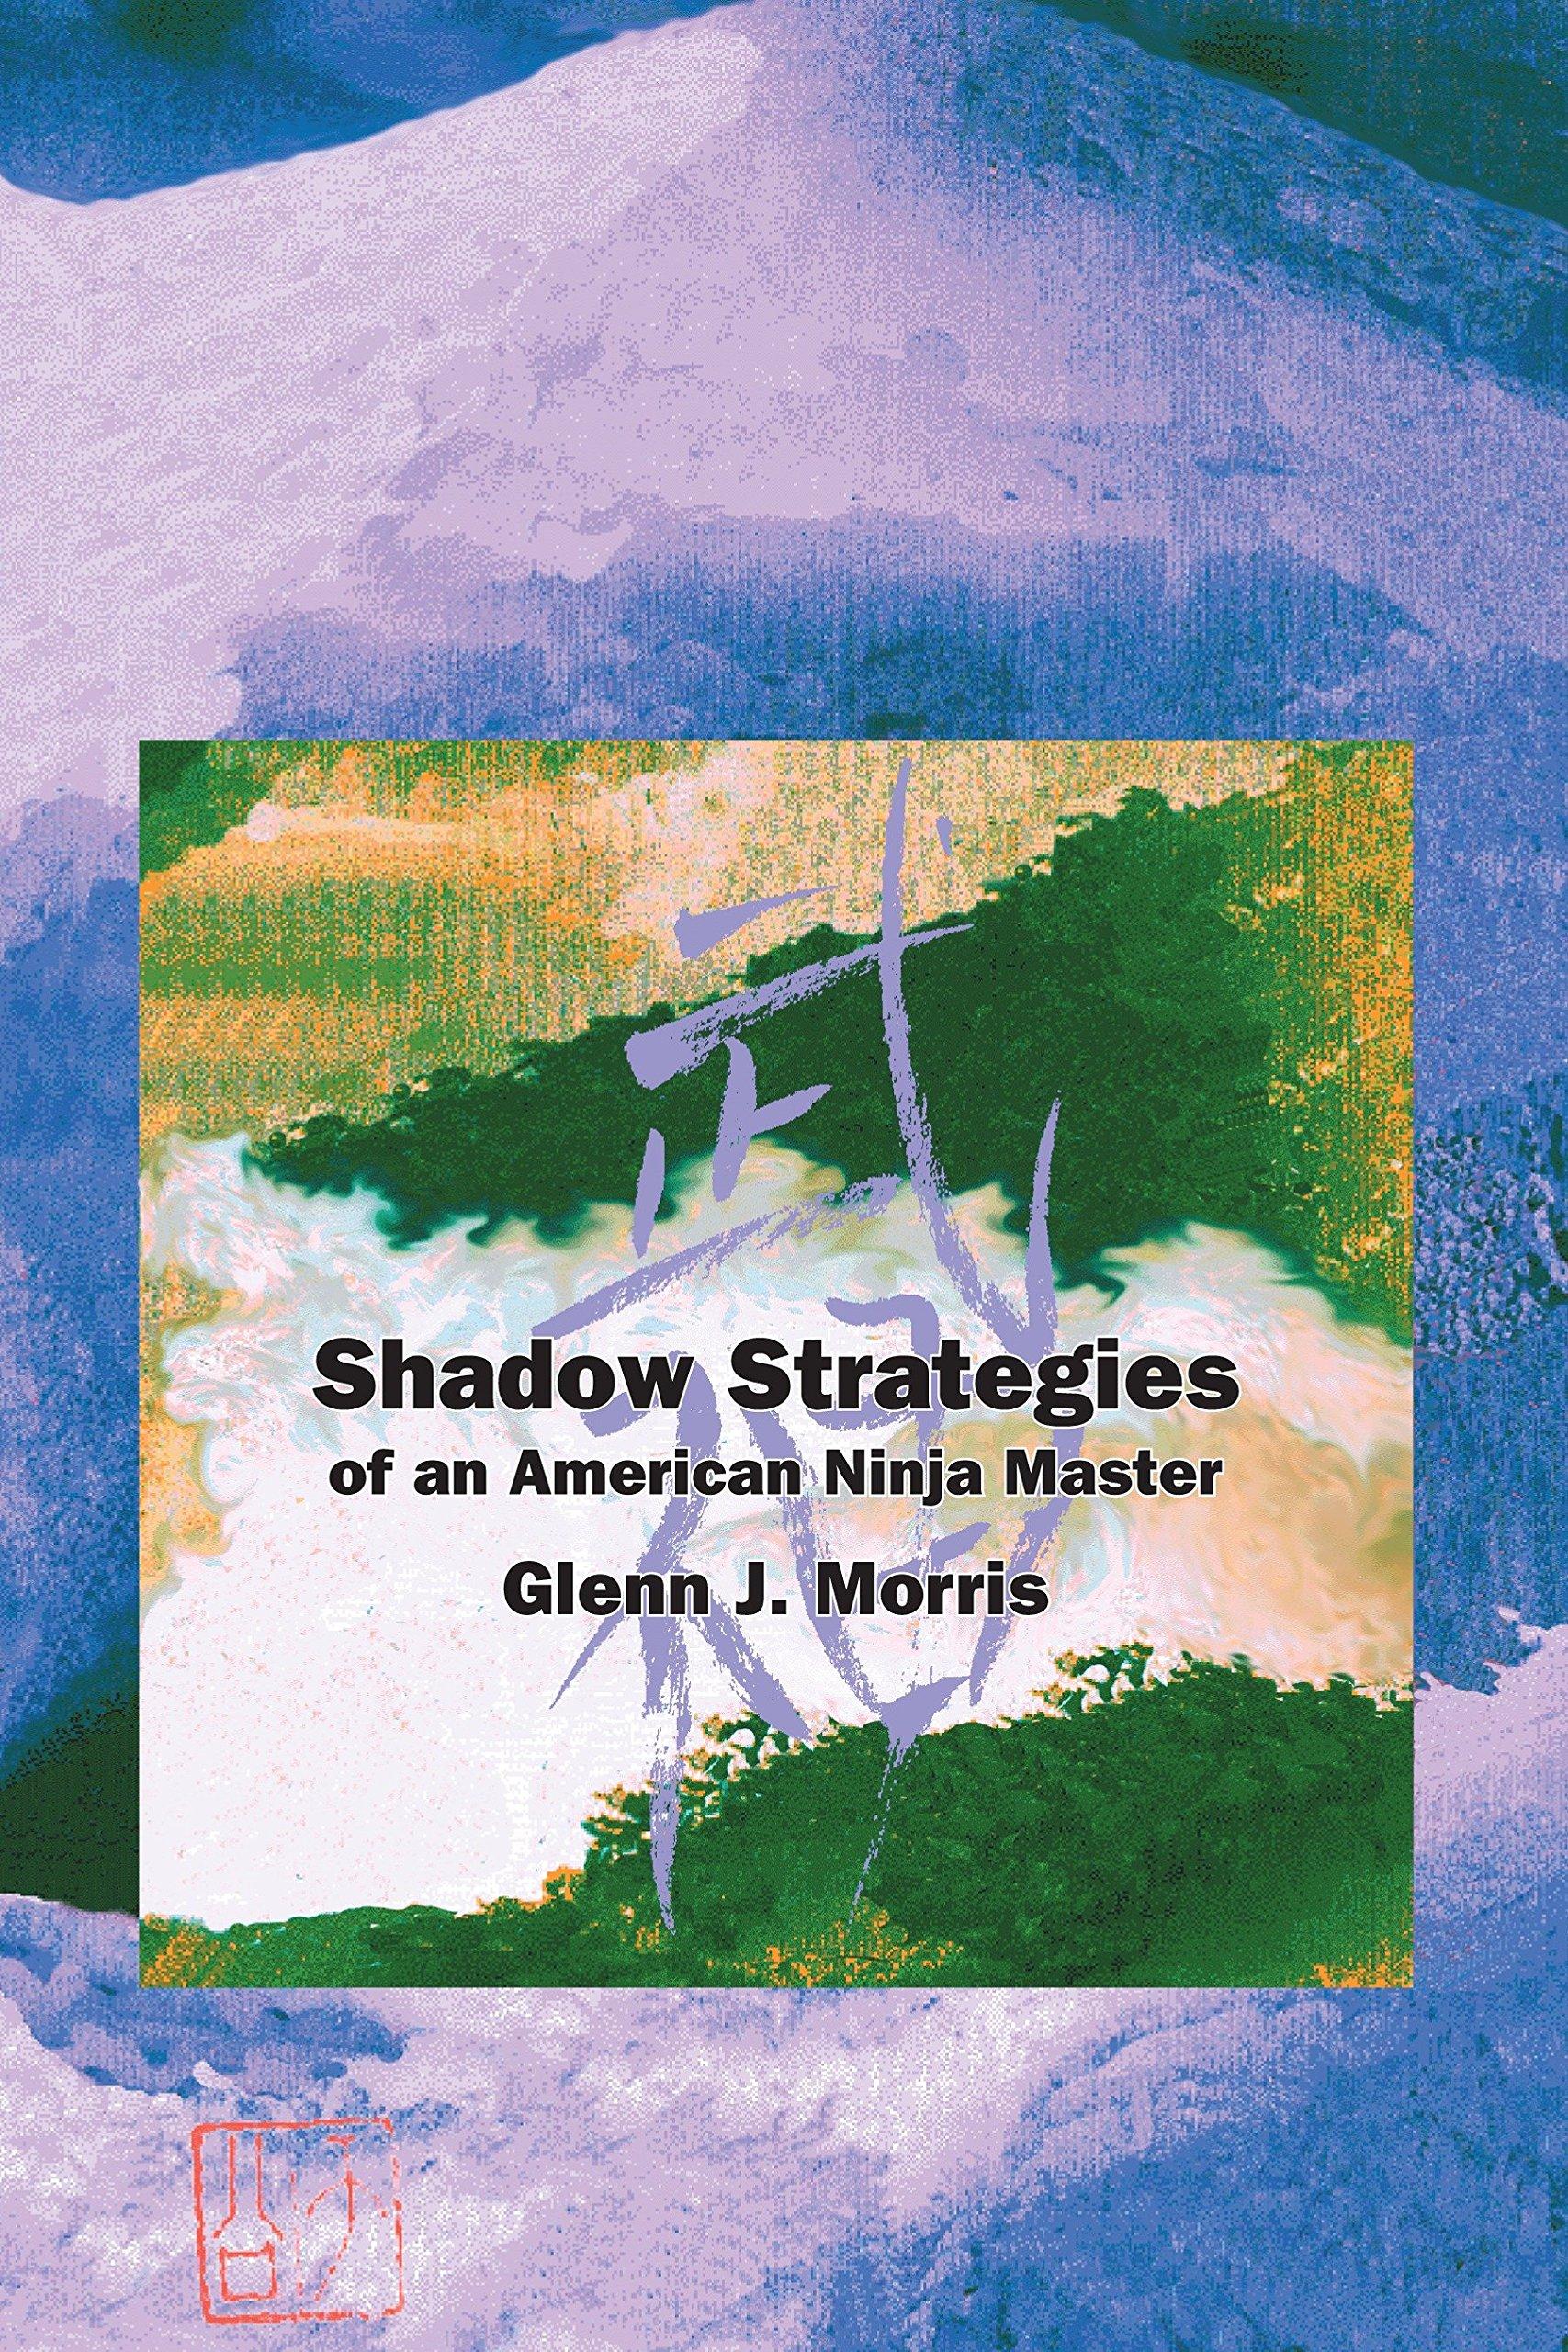 Shadow Strategies Ninja: Amazon.es: Glenn J. Morris: Libros ...